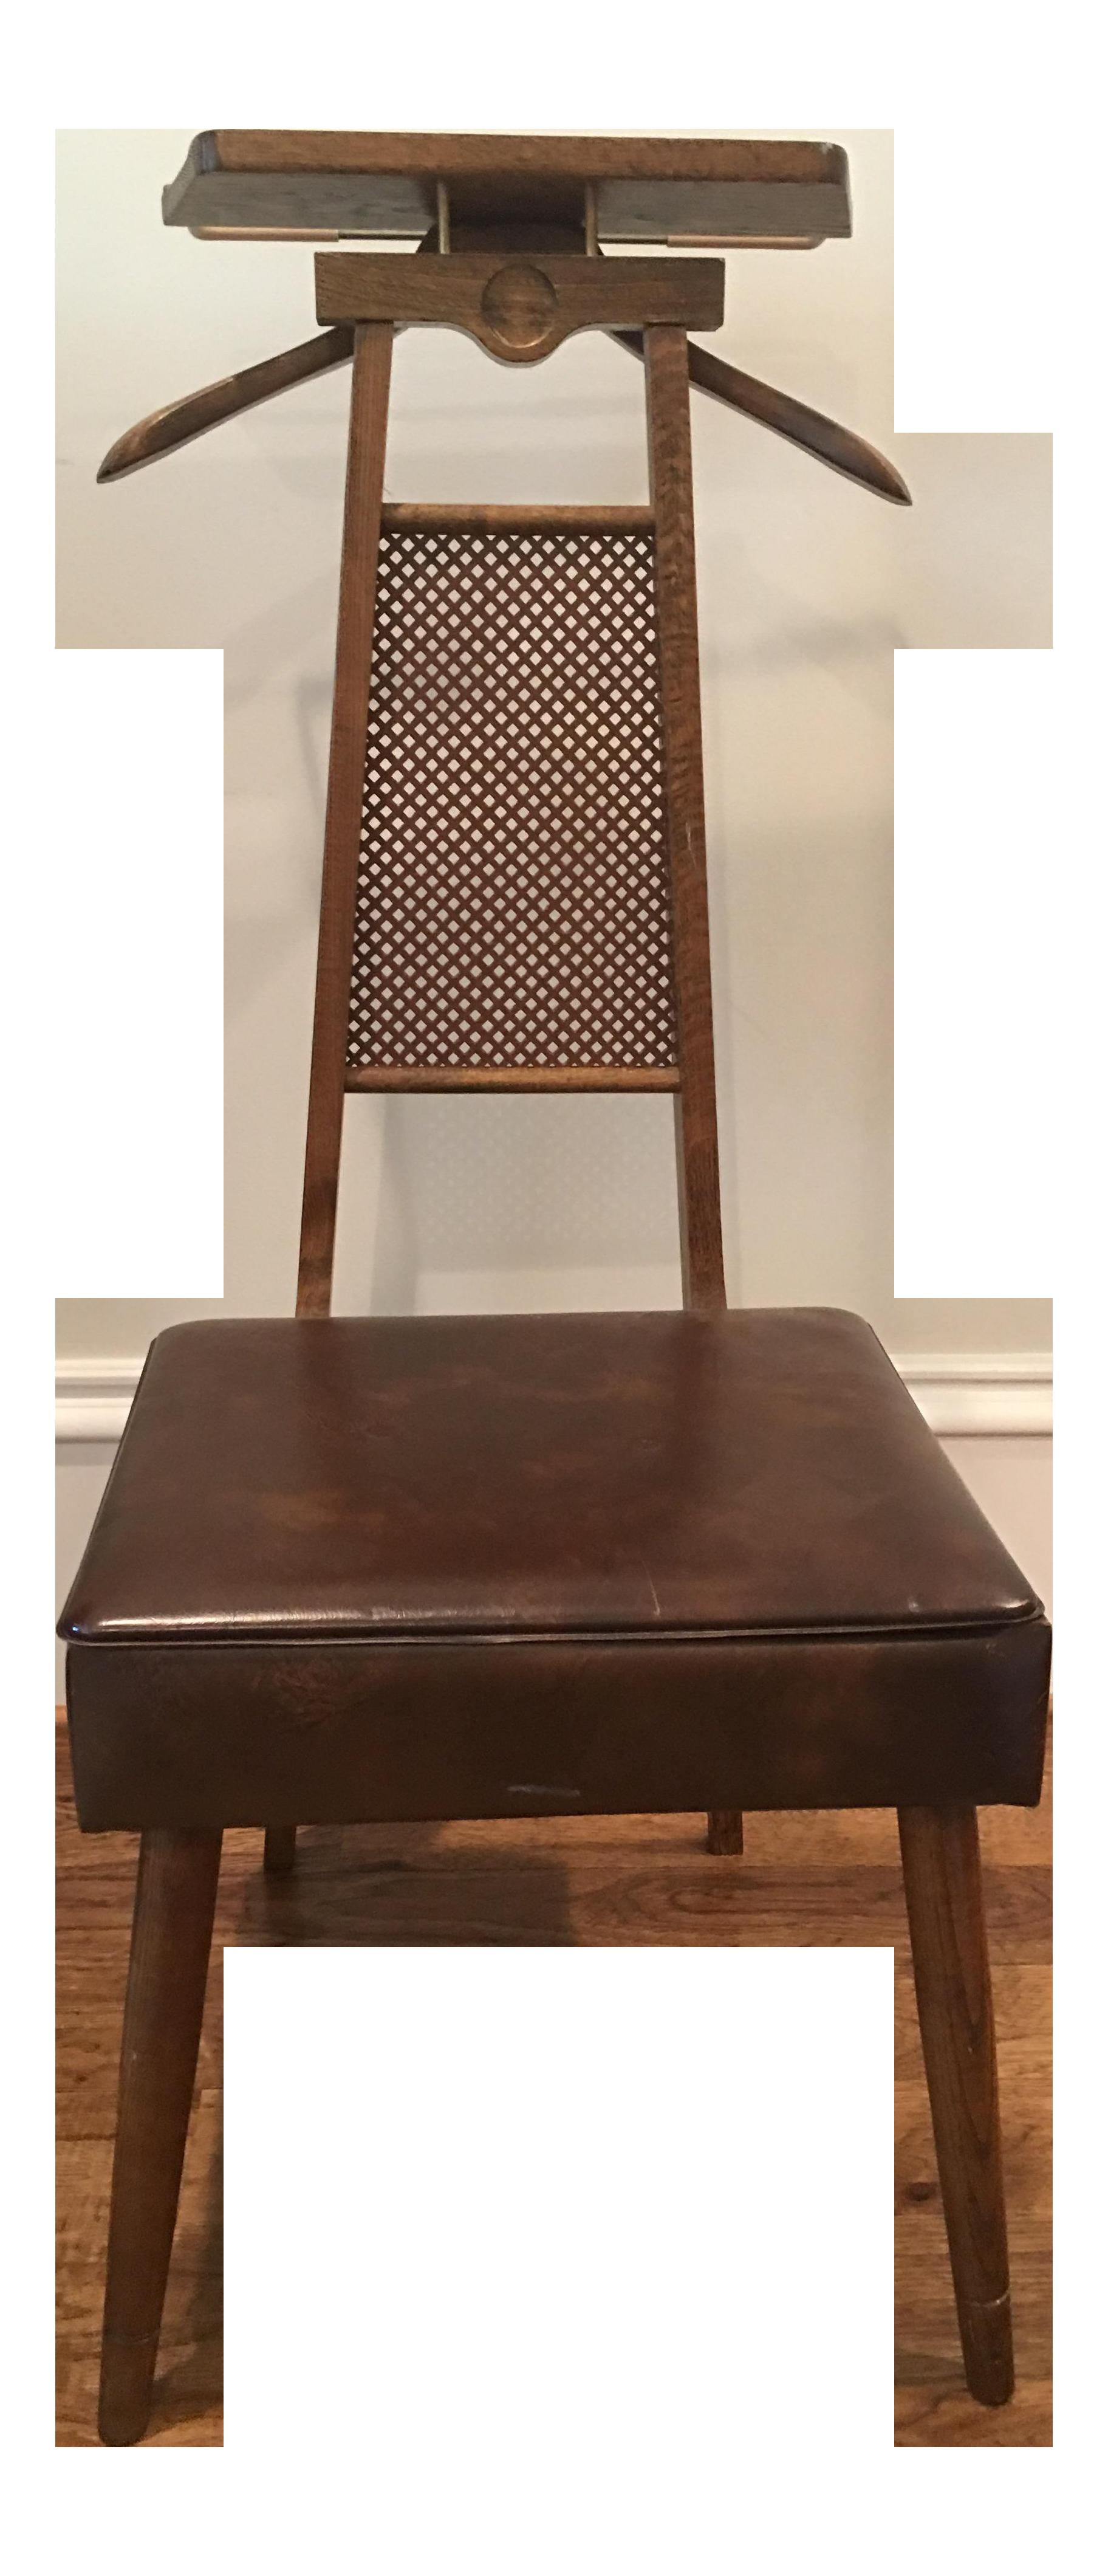 Image Of Mid Century Butleru0027s Chair